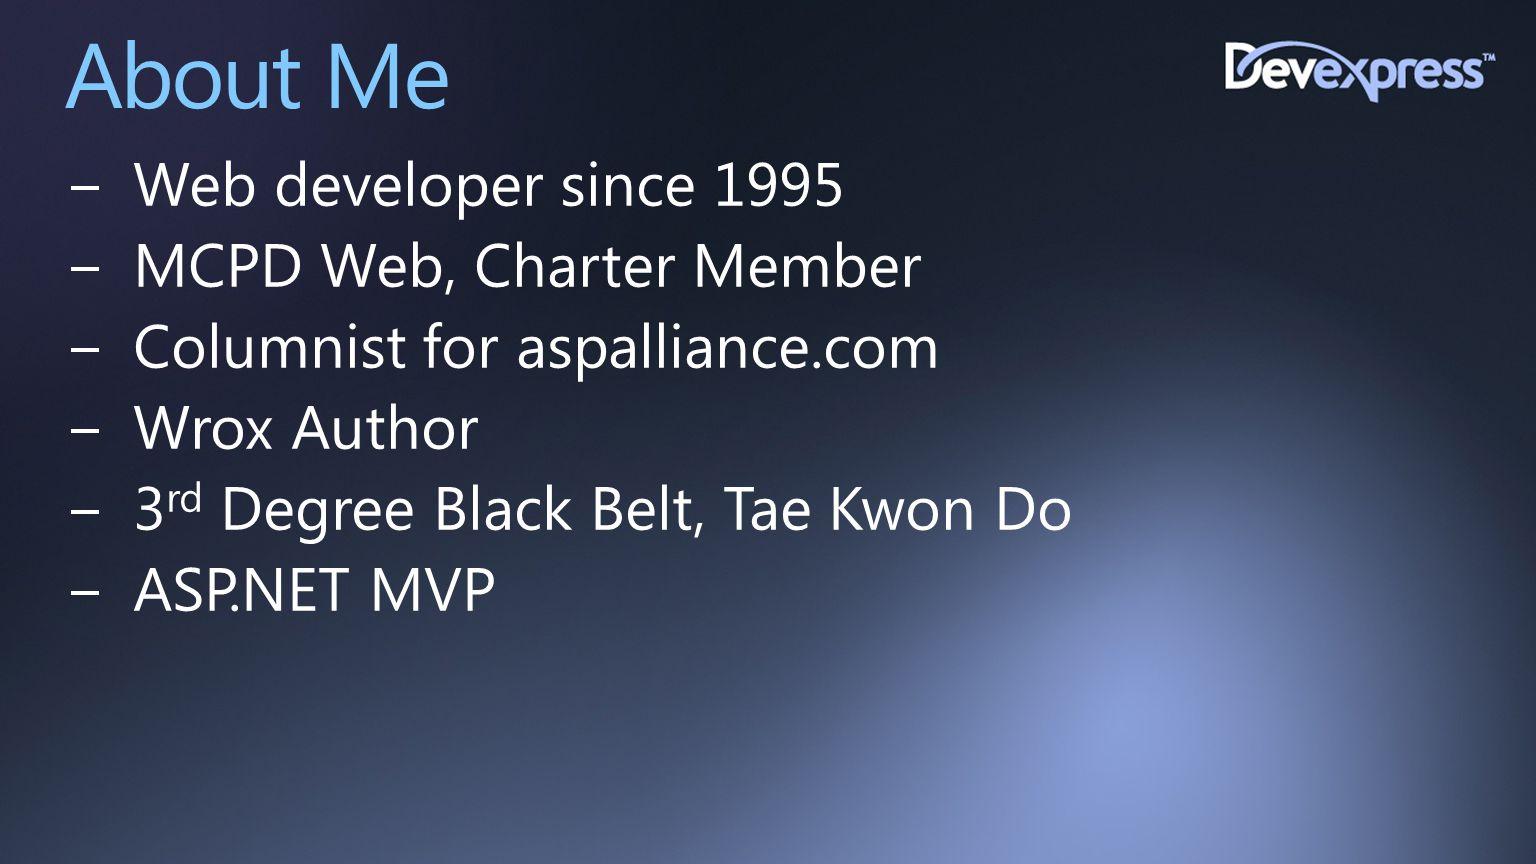 About Me −Web developer since 1995 −MCPD Web, Charter Member −Columnist for aspalliance.com −Wrox Author −3 rd Degree Black Belt, Tae Kwon Do −ASP.NET